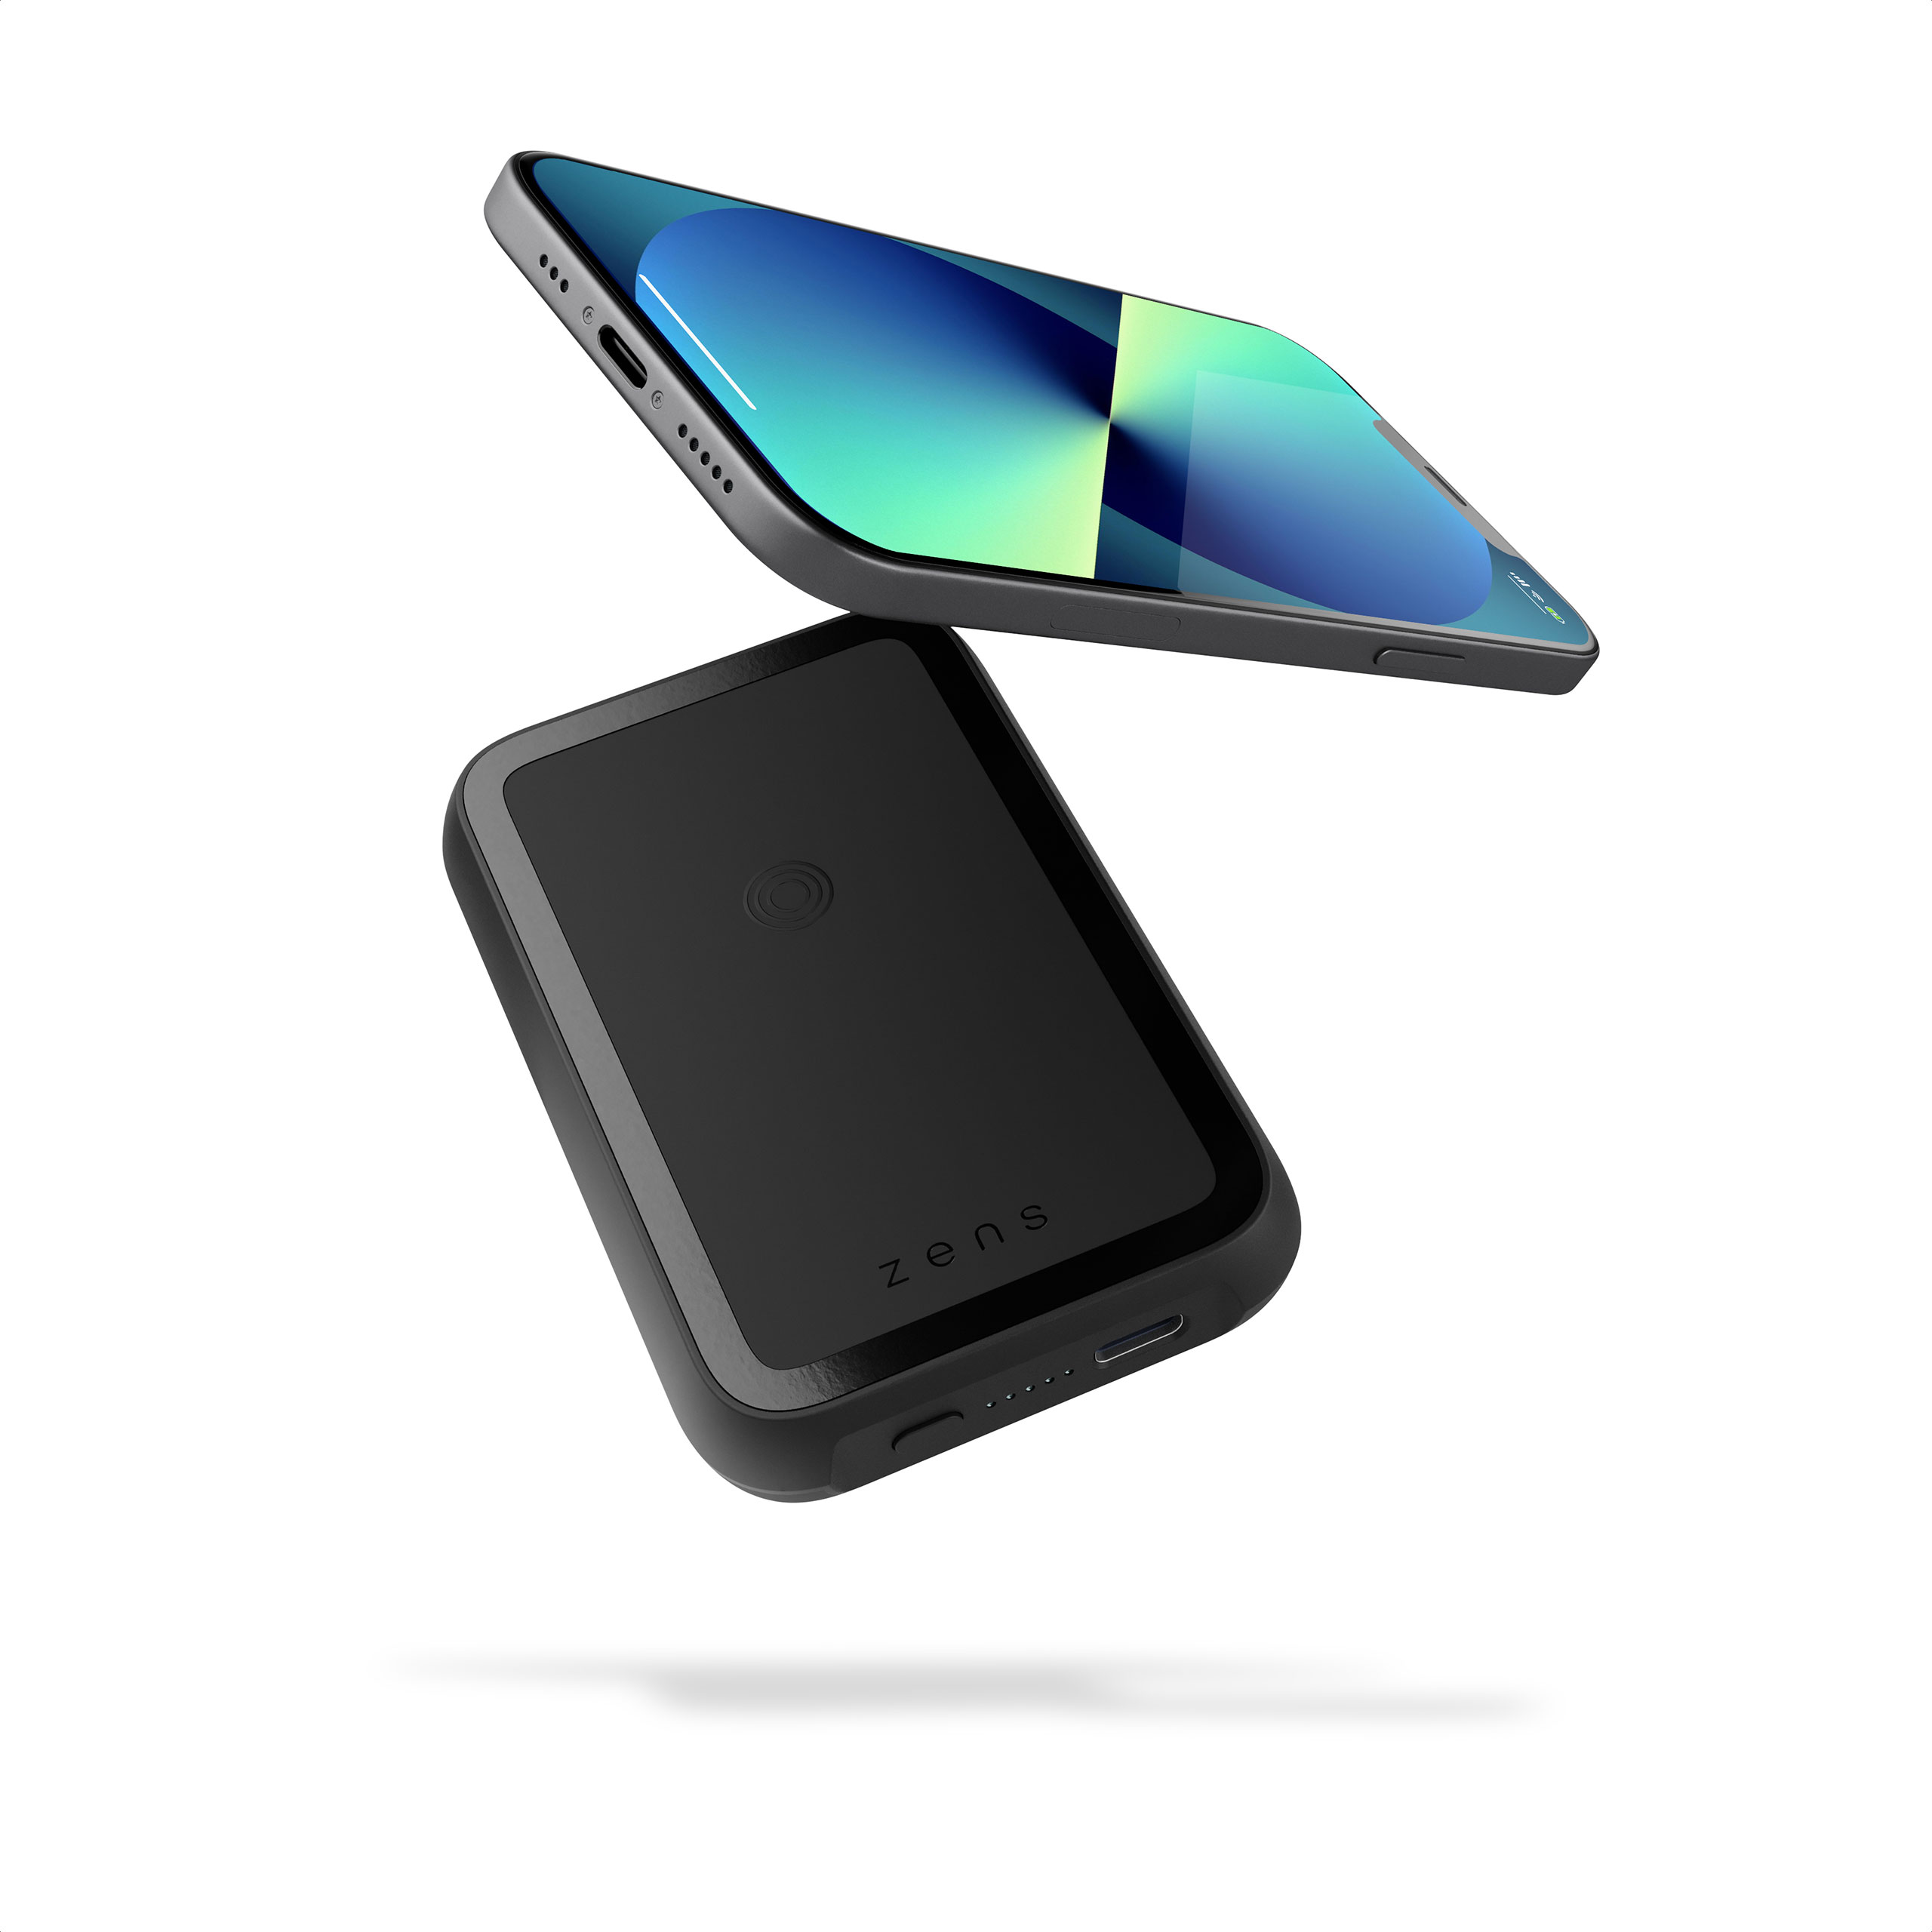 ZEPP01M - Magnetic Single Powerbank with iPhone 13